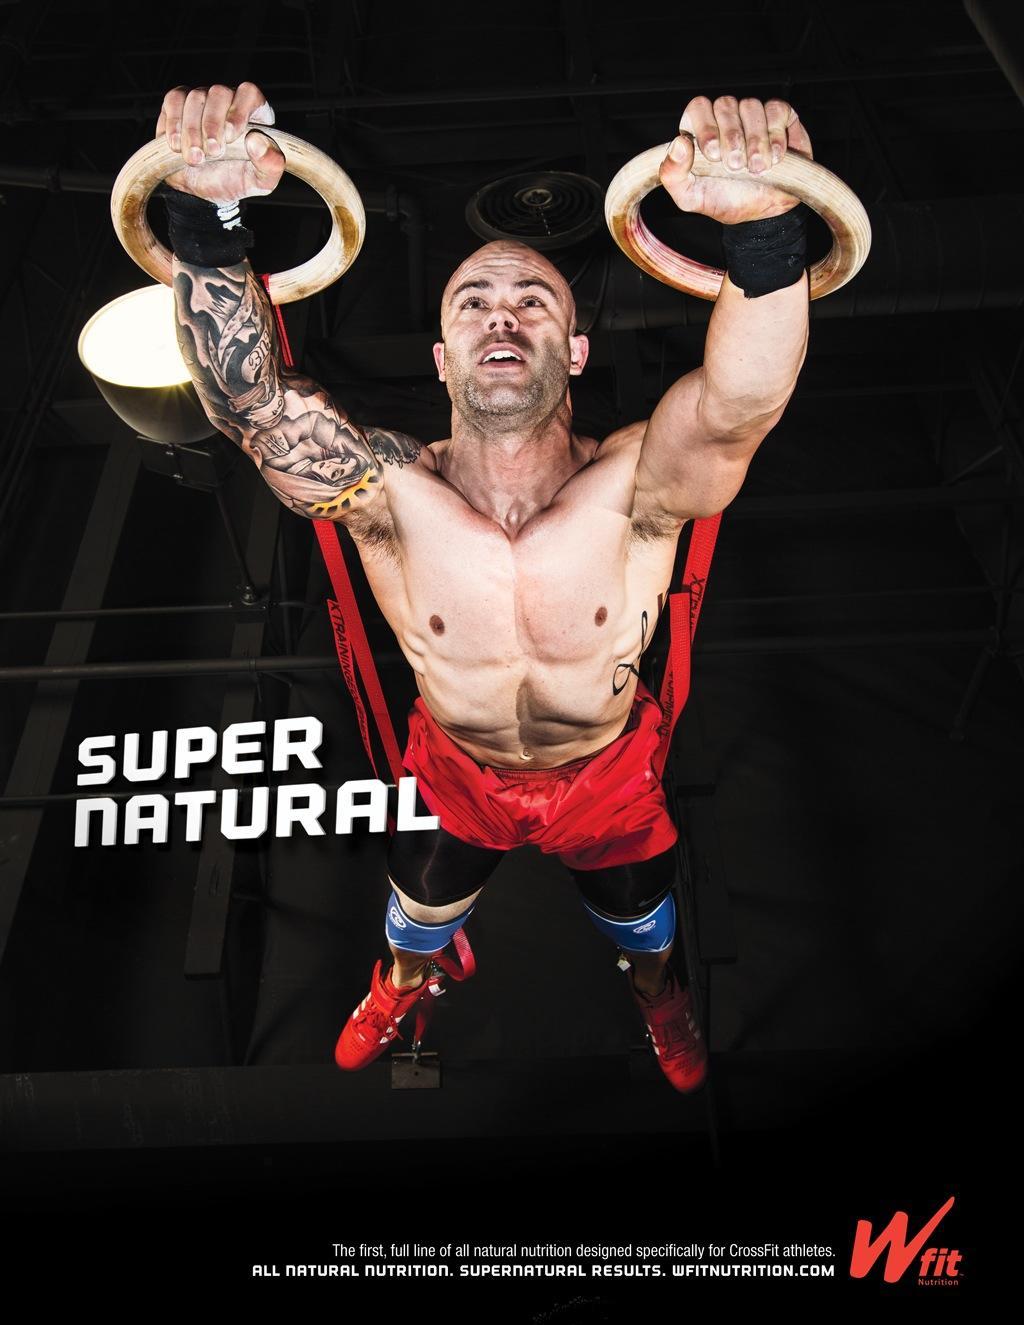 Wfit Nutrition Print Ad -  Super Natural, 4